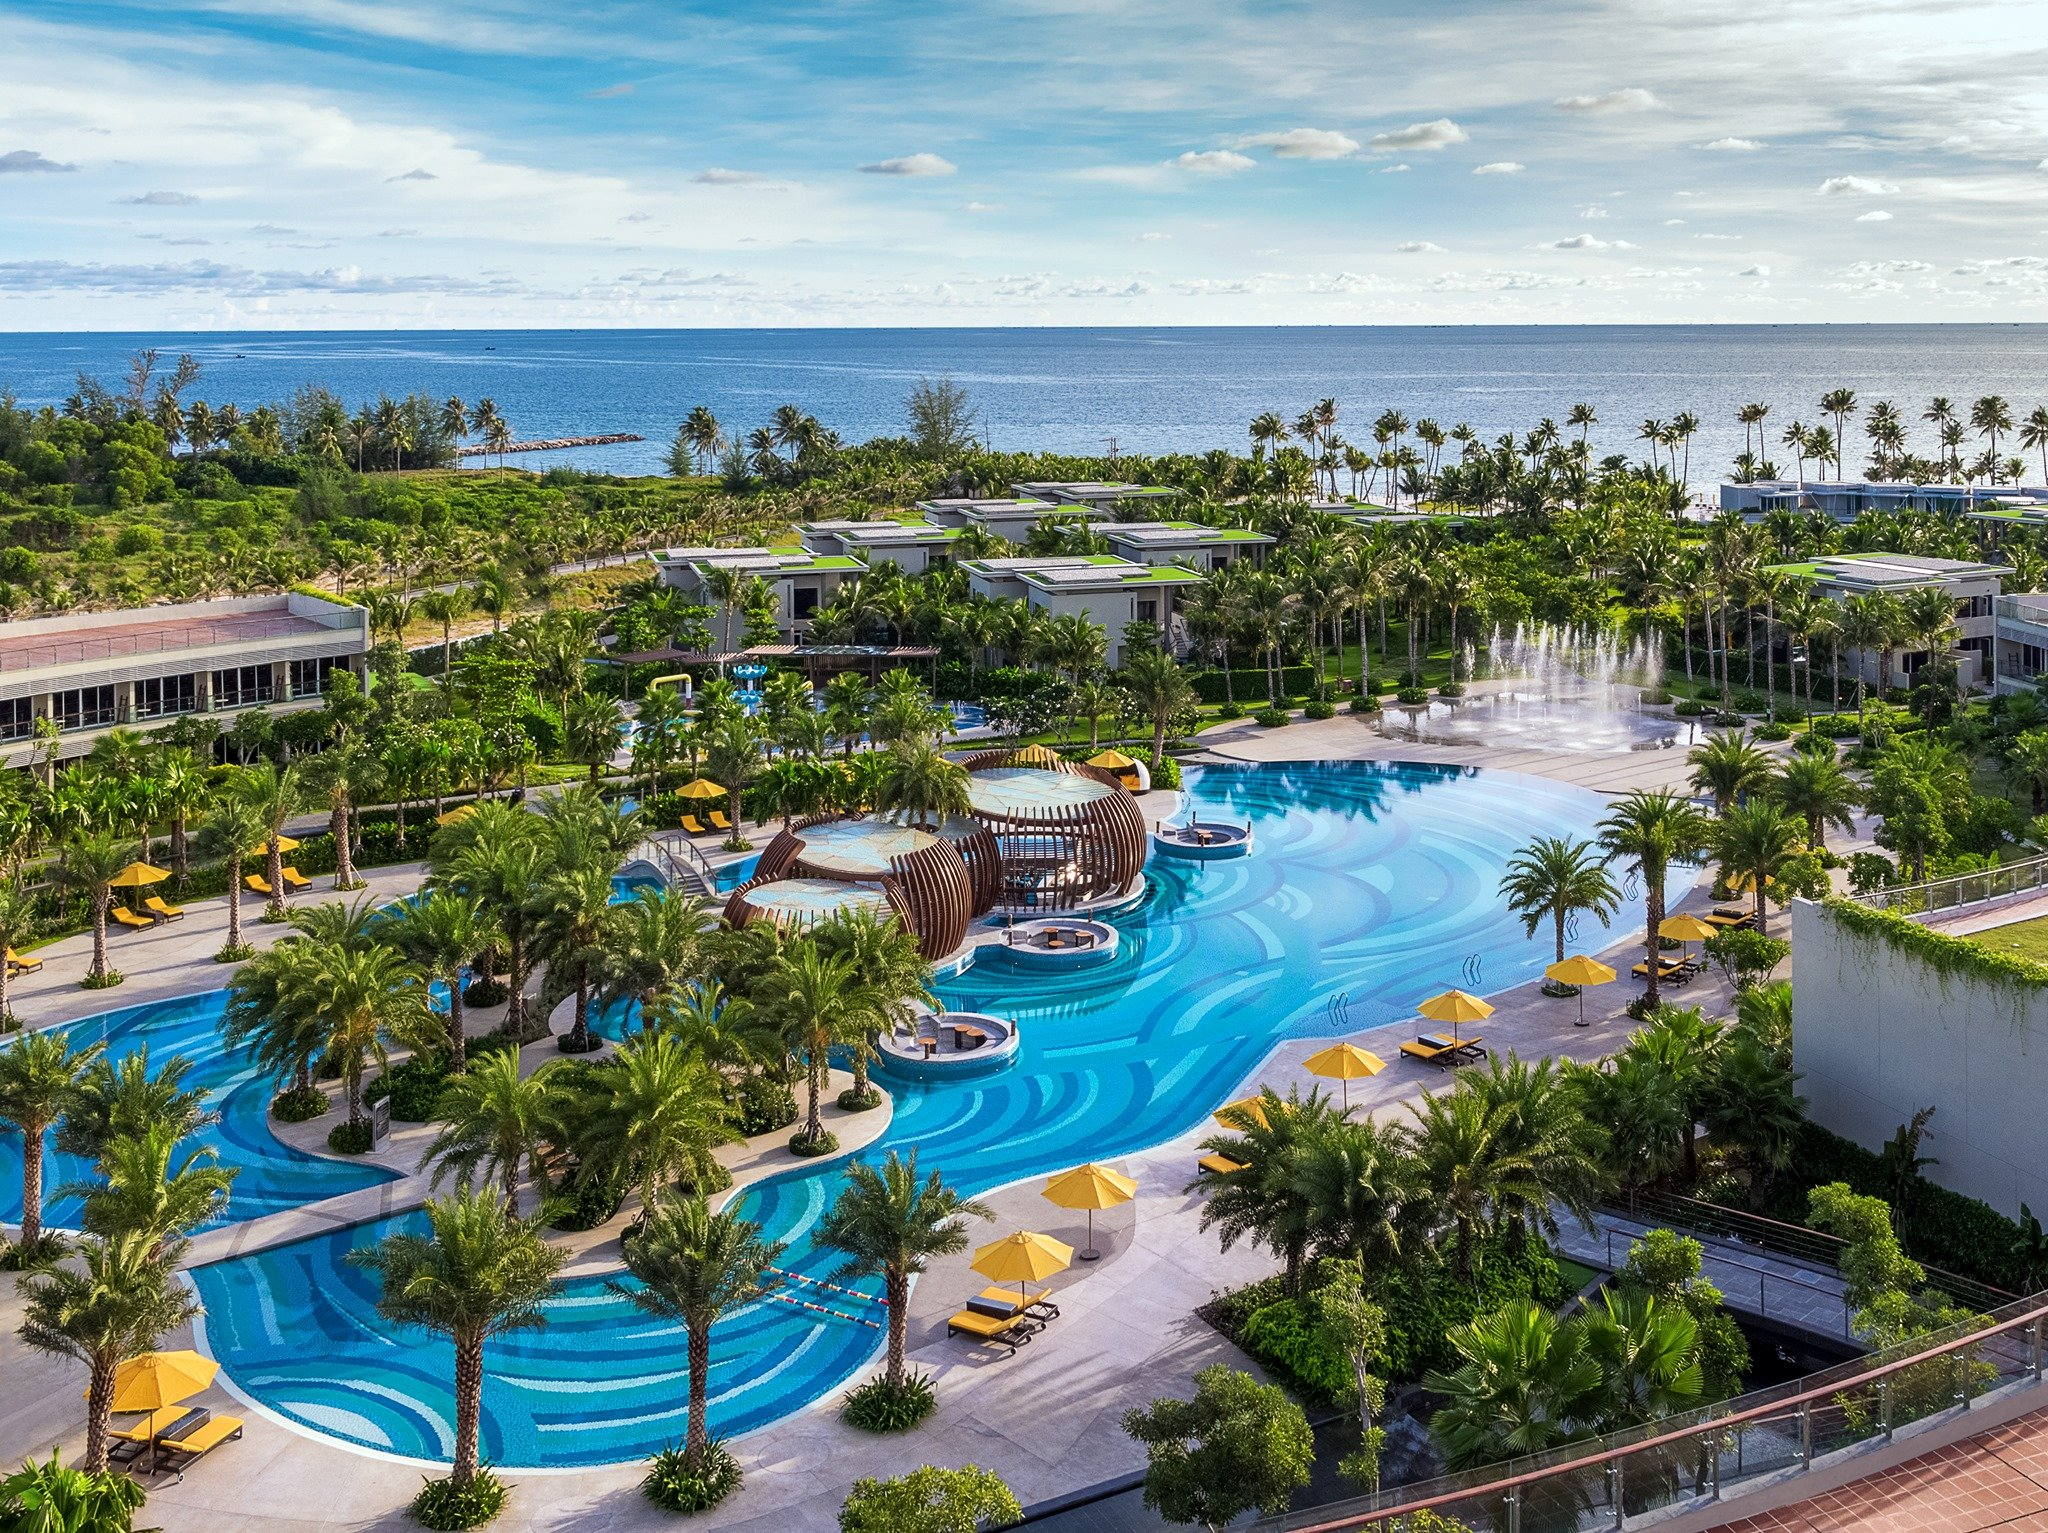 top-9-resort-phu-quoc-tet-duong-lich-ivivu-7